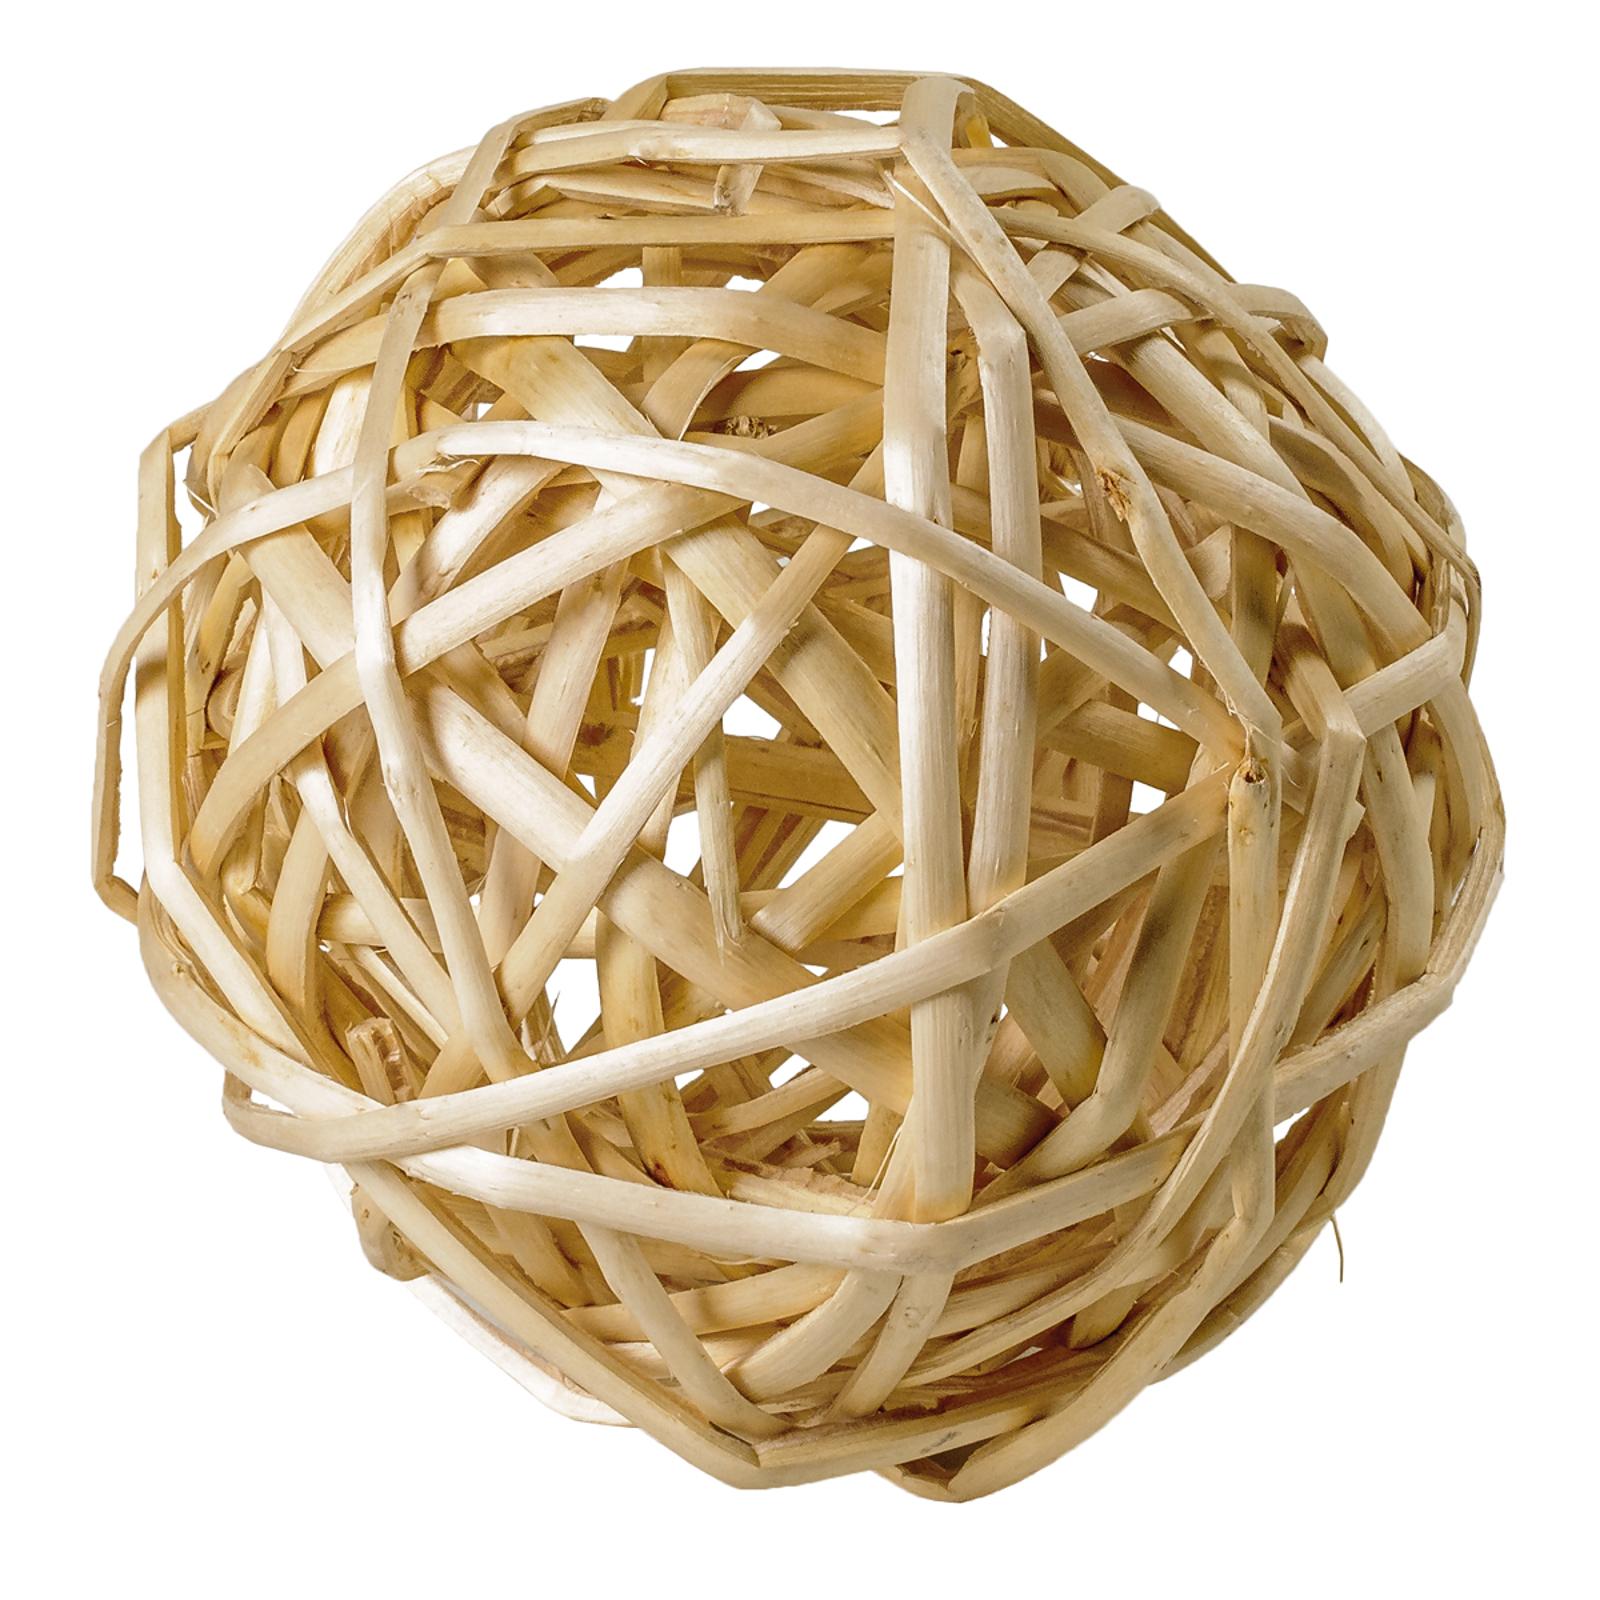 1 weidenball 15 cm weidenkugel dekokugel als dekoration - Dekoration basteln ...